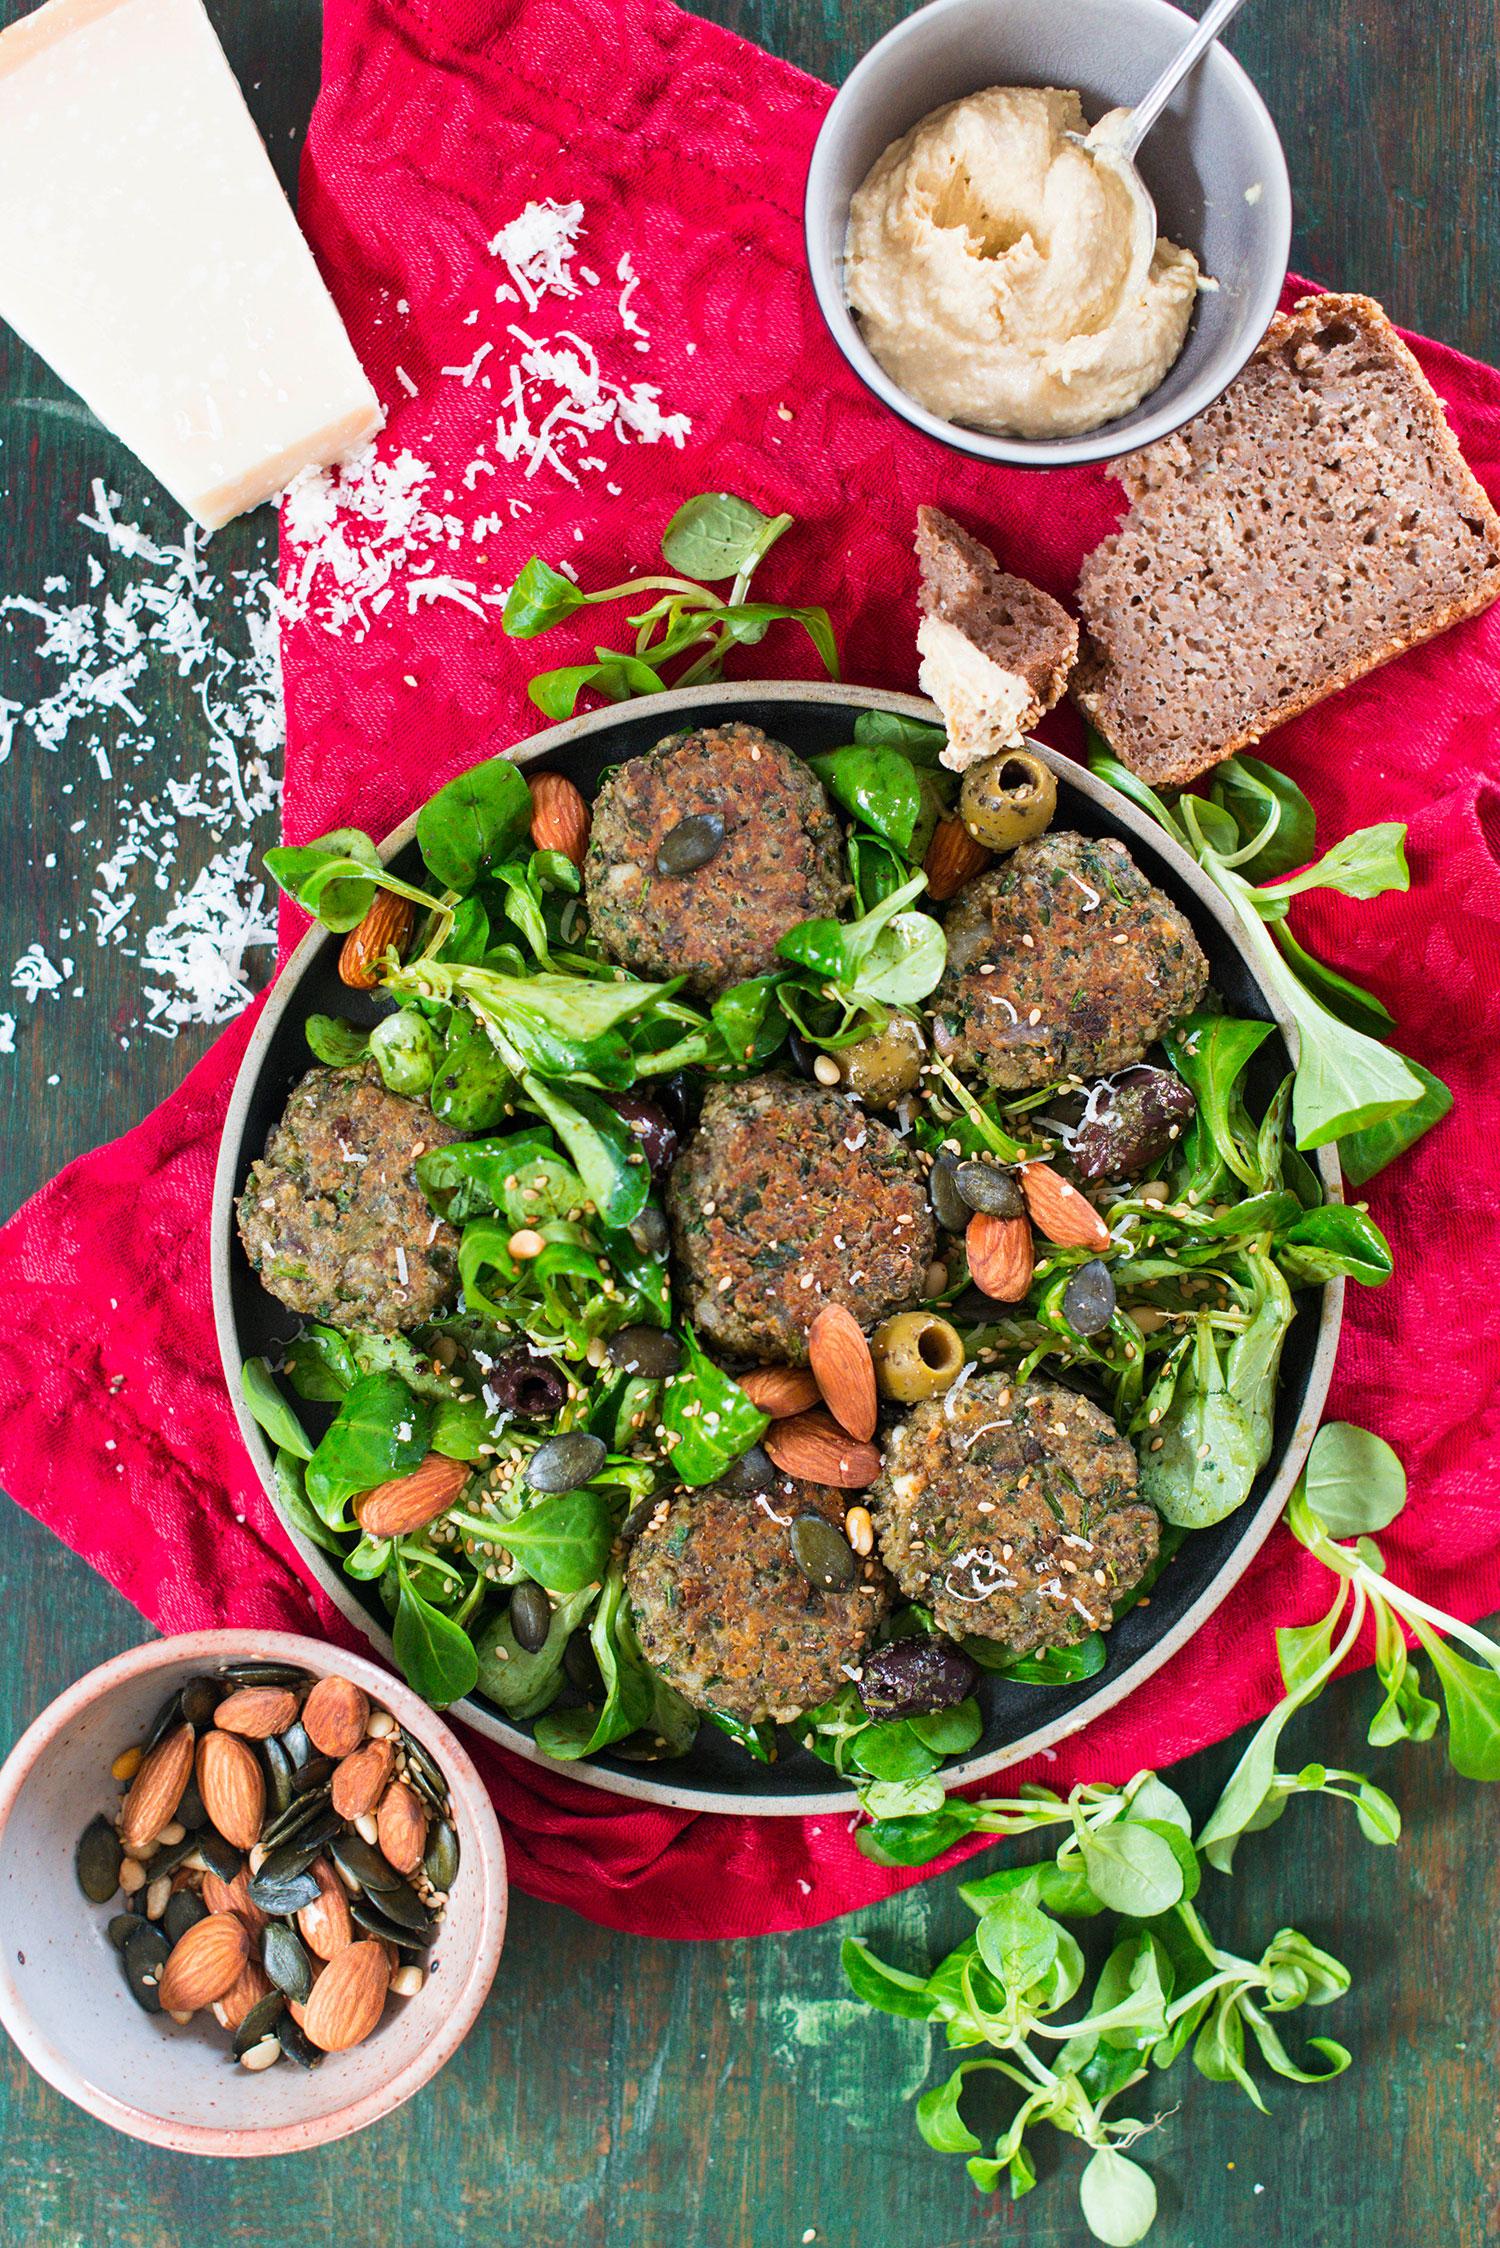 Florette_lambs-lettuce-mushroom-fritters-3